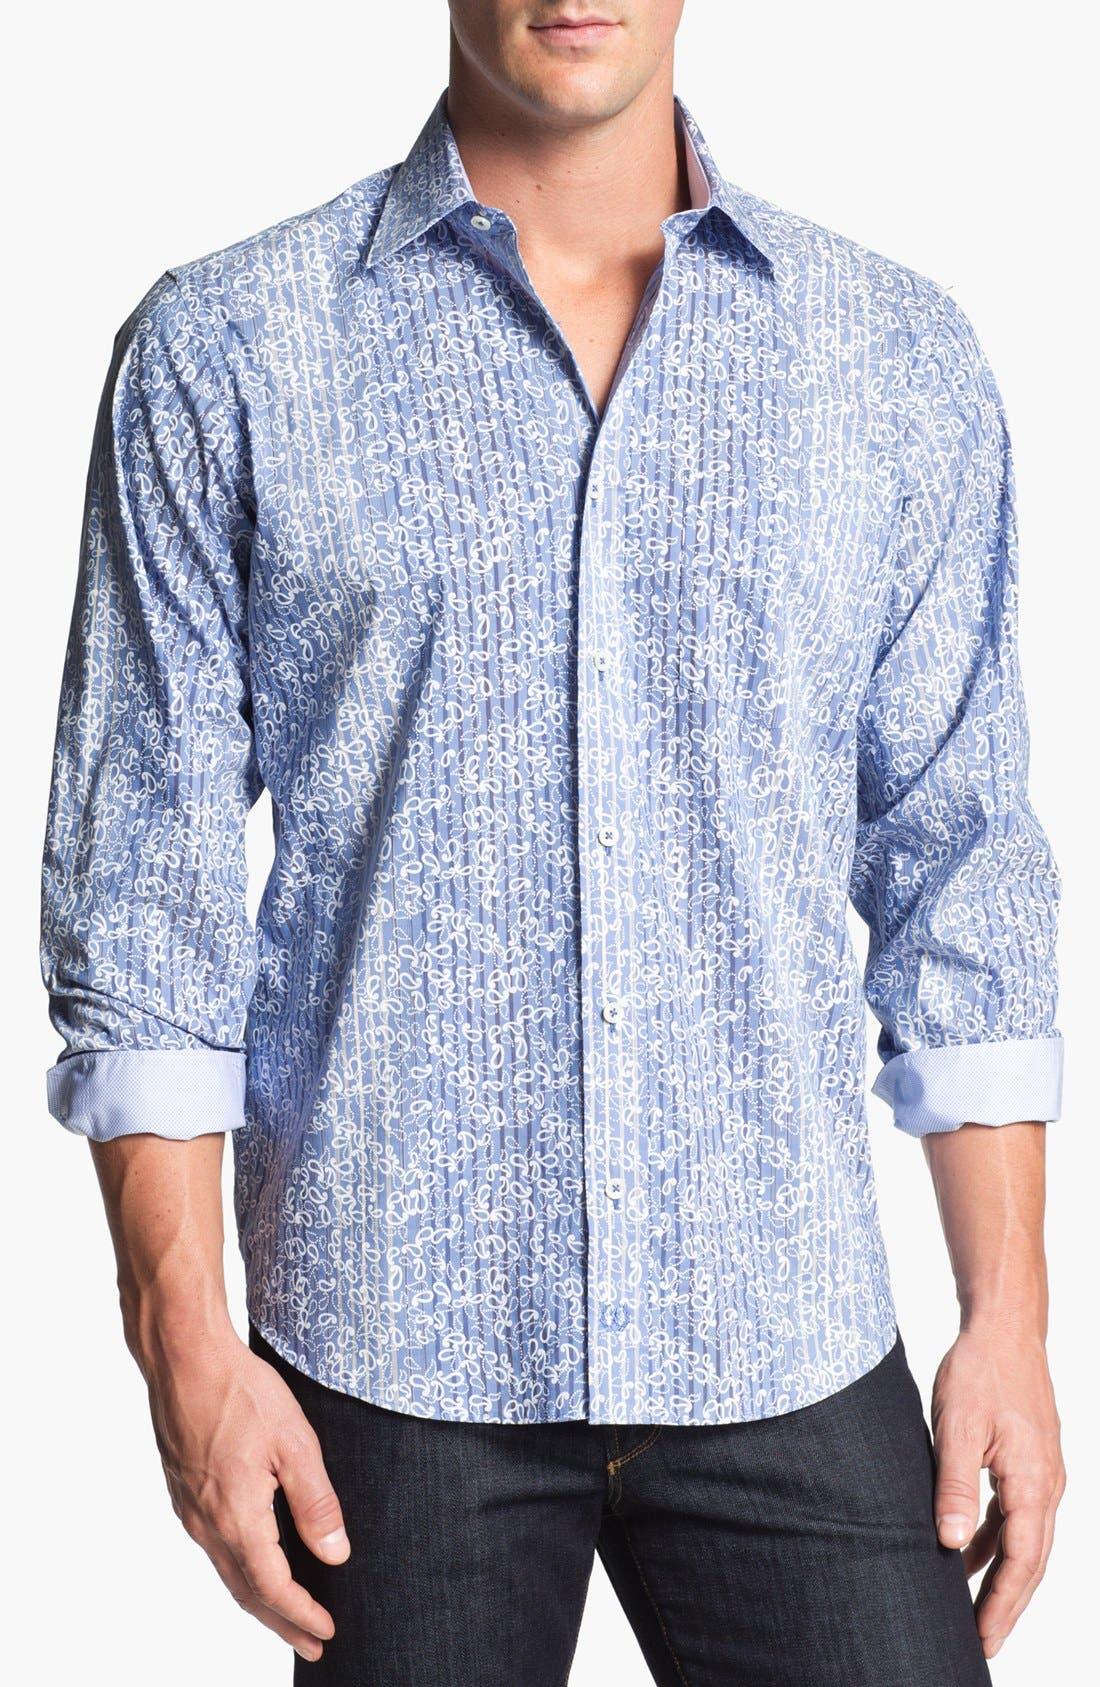 Main Image - Bugatchi Striped Paisley Classic Fit Cotton Sport Shirt